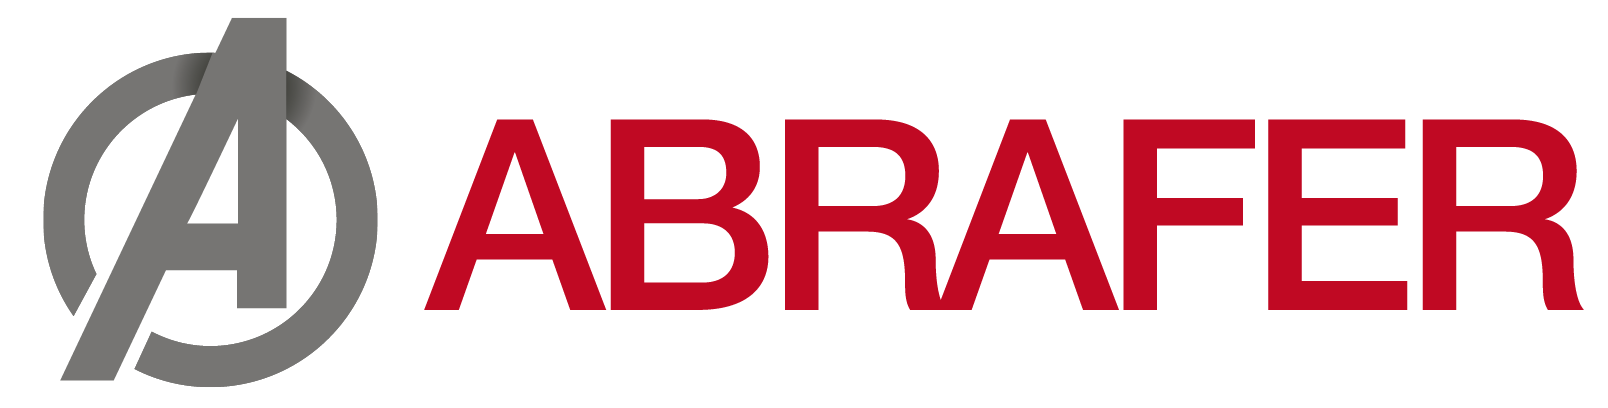 ABRAFER S.R.L.